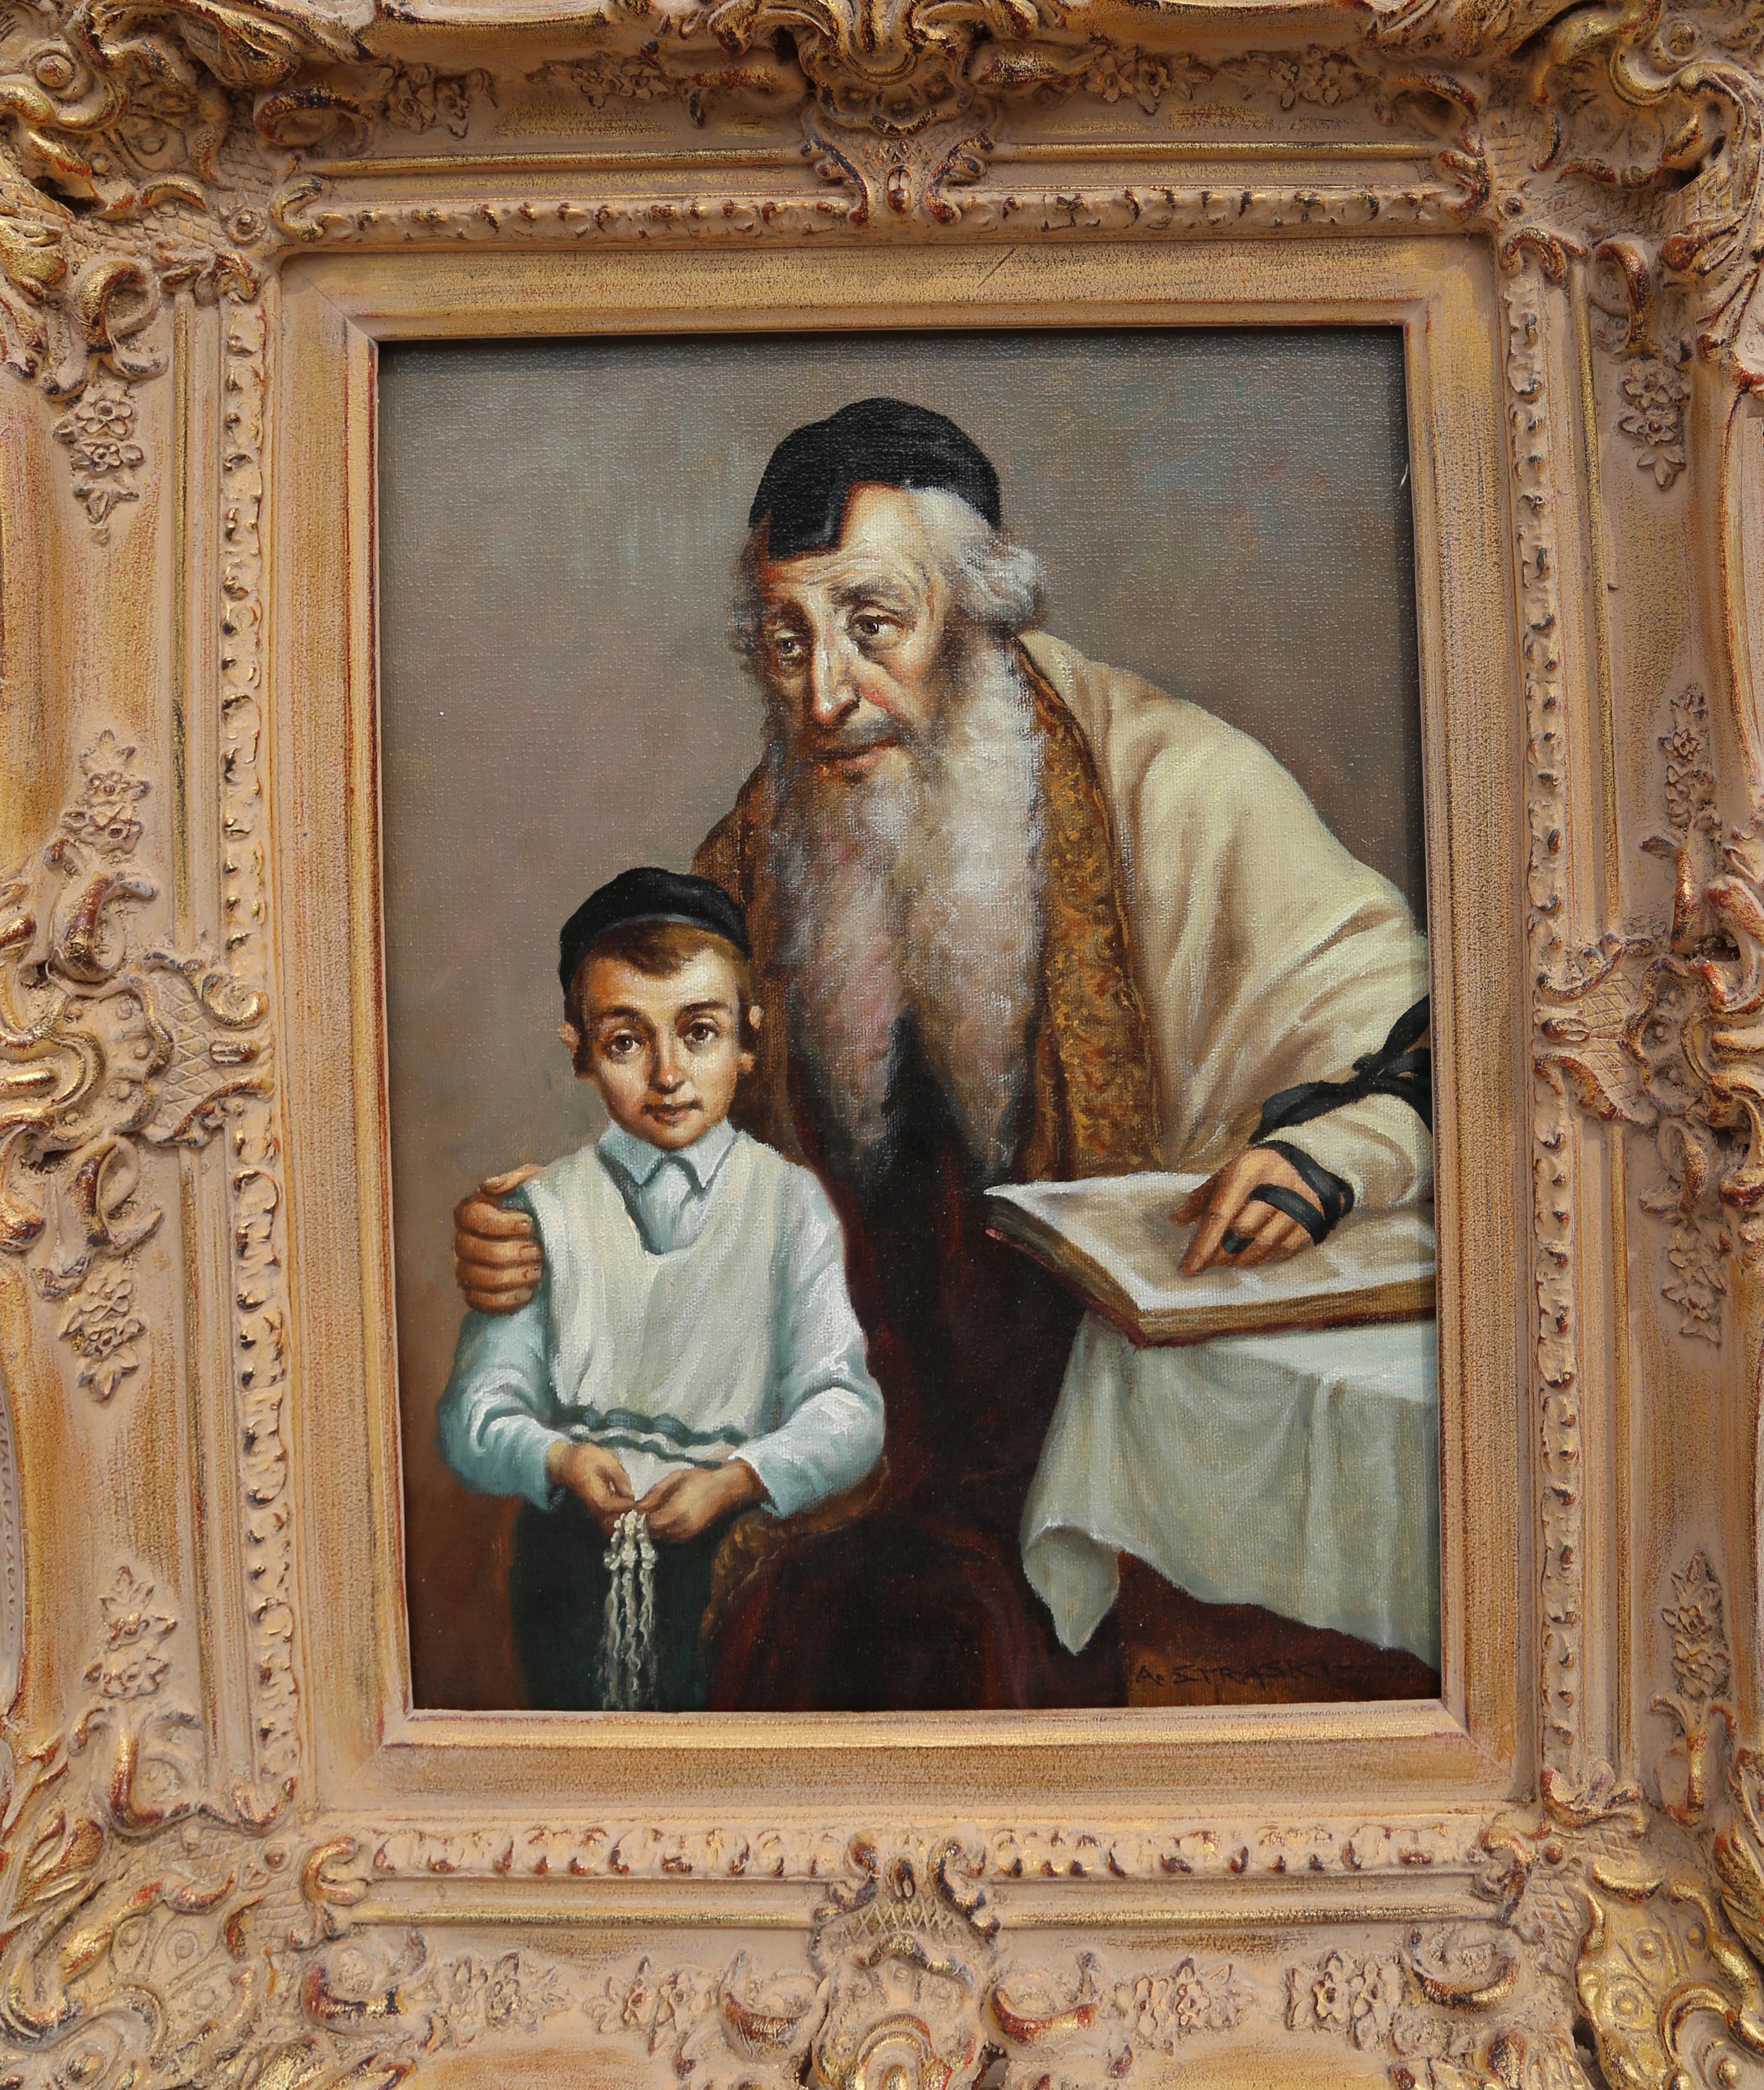 Rabbi and Student, Oil Painting by Abraham Straski 1957